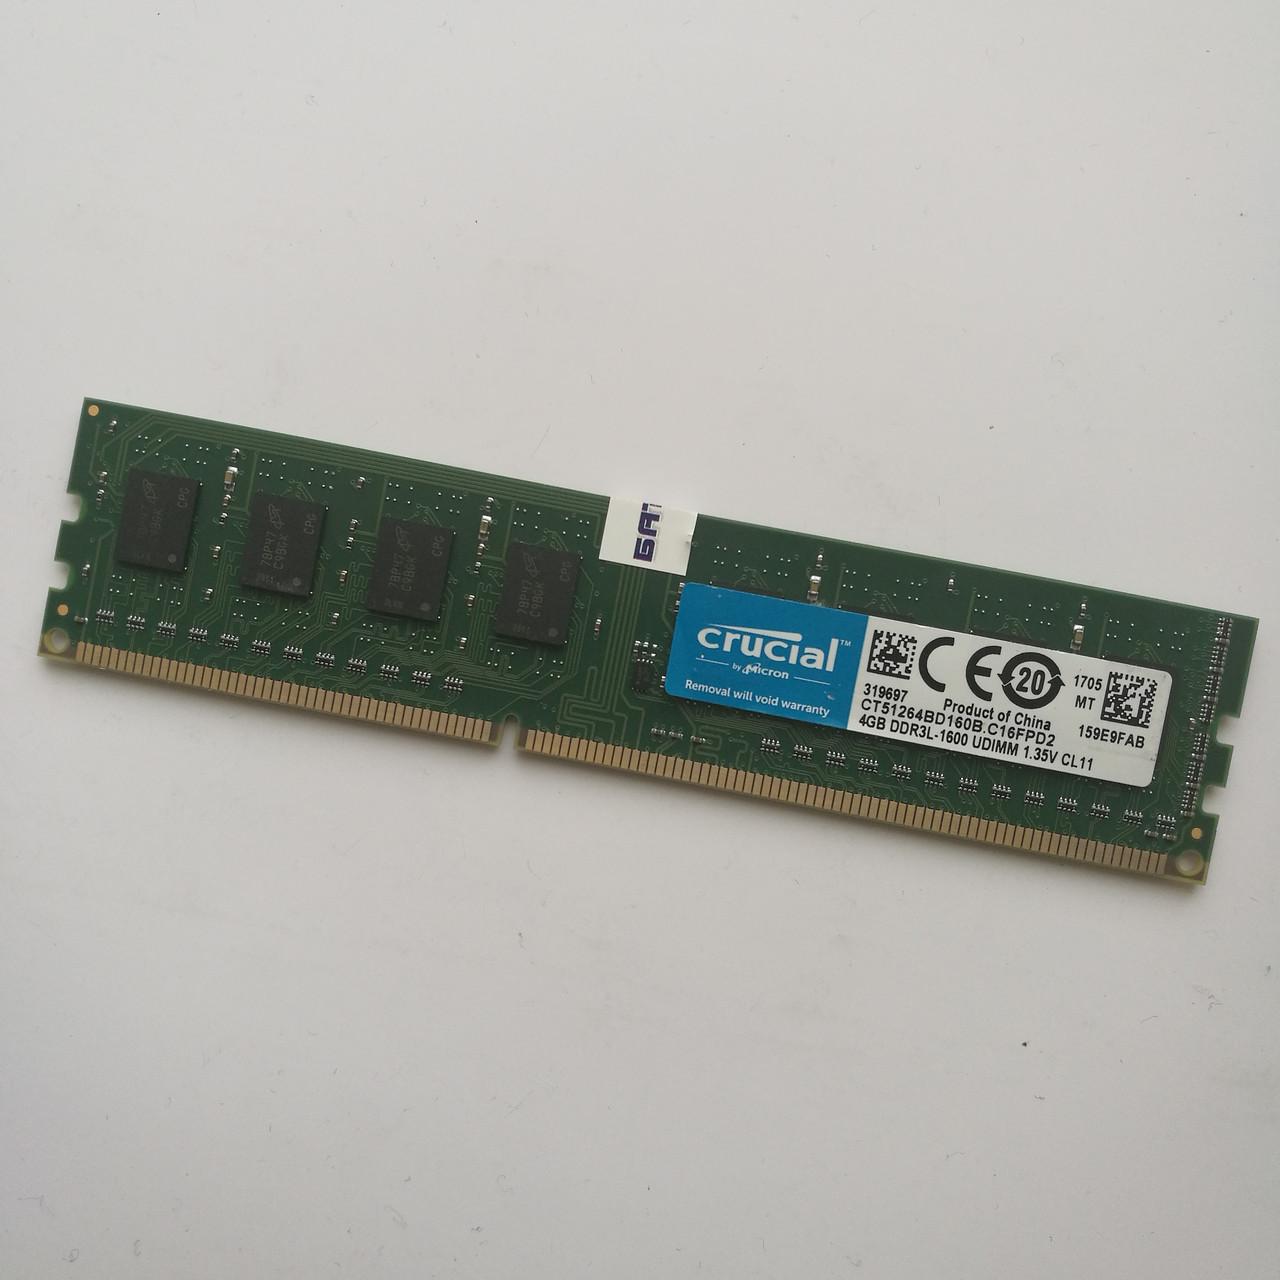 Оперативная память Crucial DDR3L 4Gb 1600MHz PC3L-12800 2R8 CL11 (CT51264BD160B.C16FPD2) Б/У